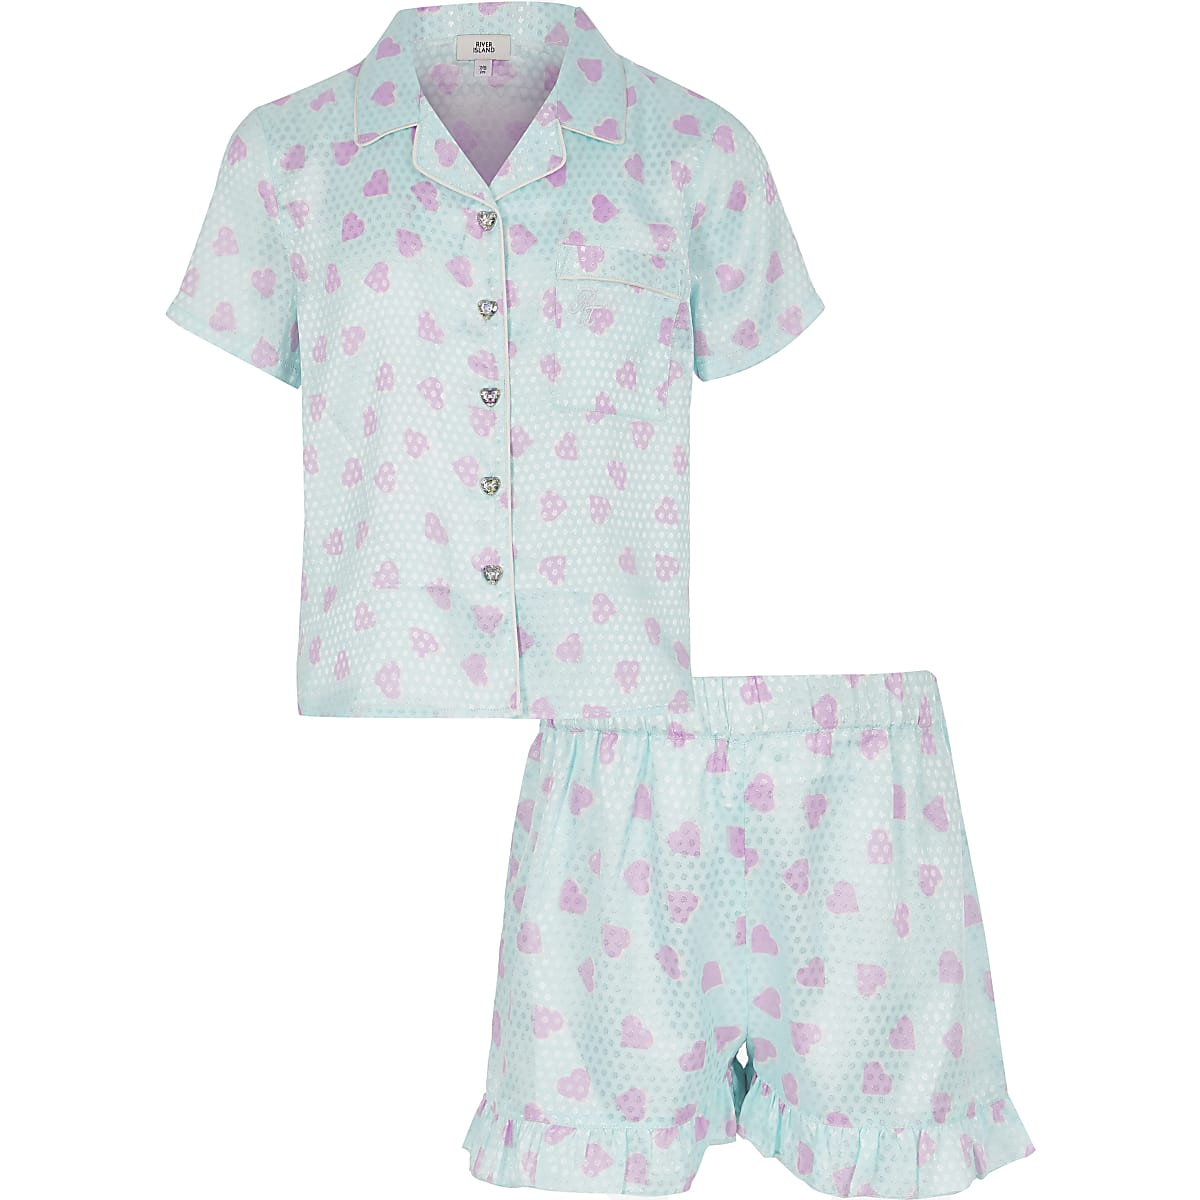 Girls blue satin printed pyjama set